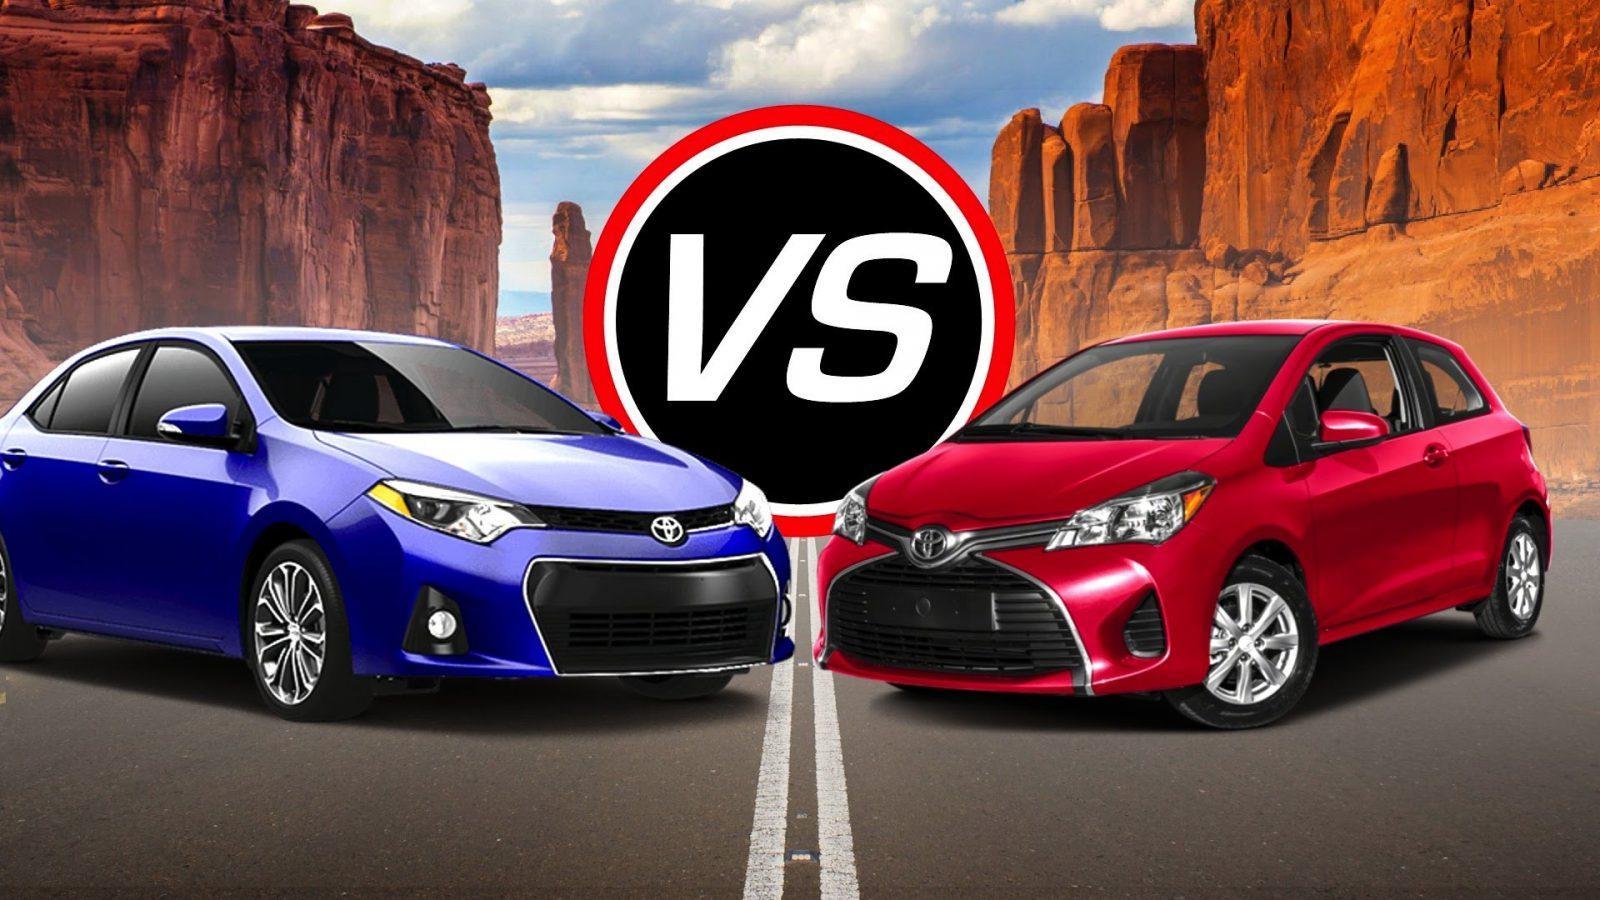 Mdx Vs Pilot >> Toyota Yaris Vs Corolla: Let's Pick the Better Car from Toyota